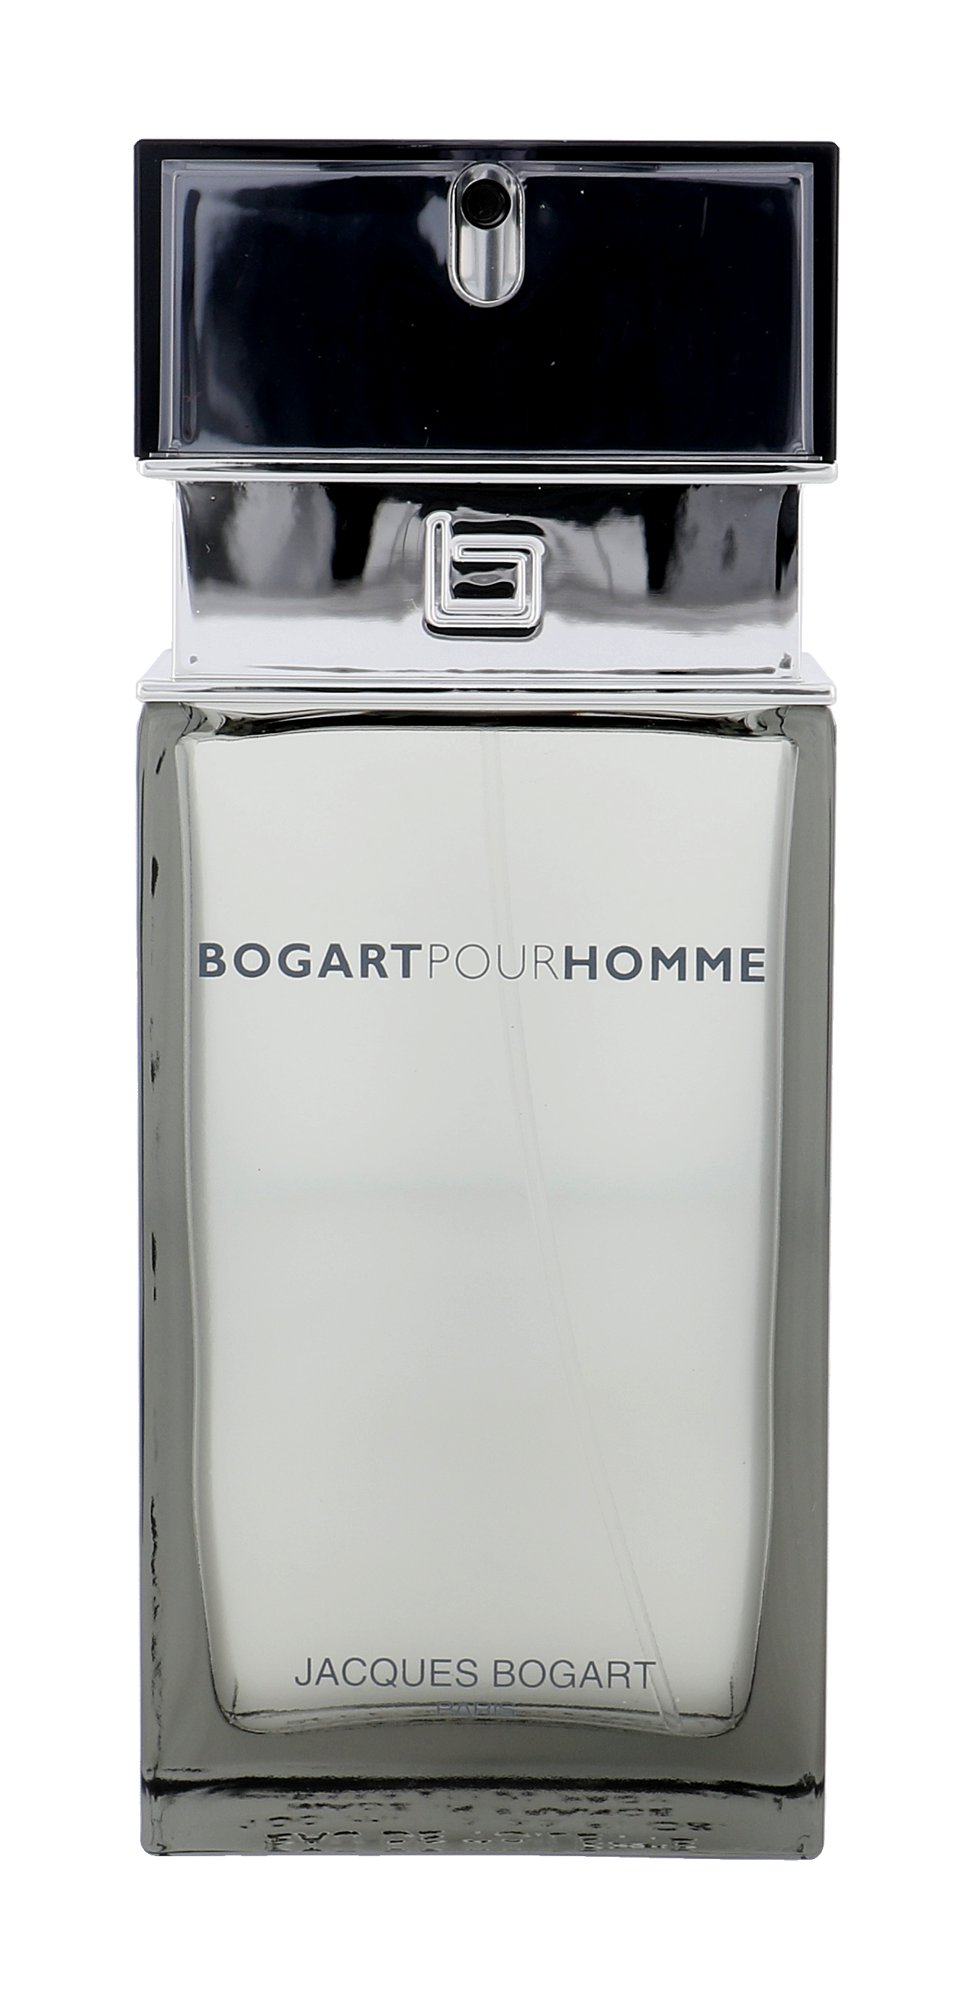 Jacques Bogart Bogart Pour Homme, Toaletná voda 100ml - Tester